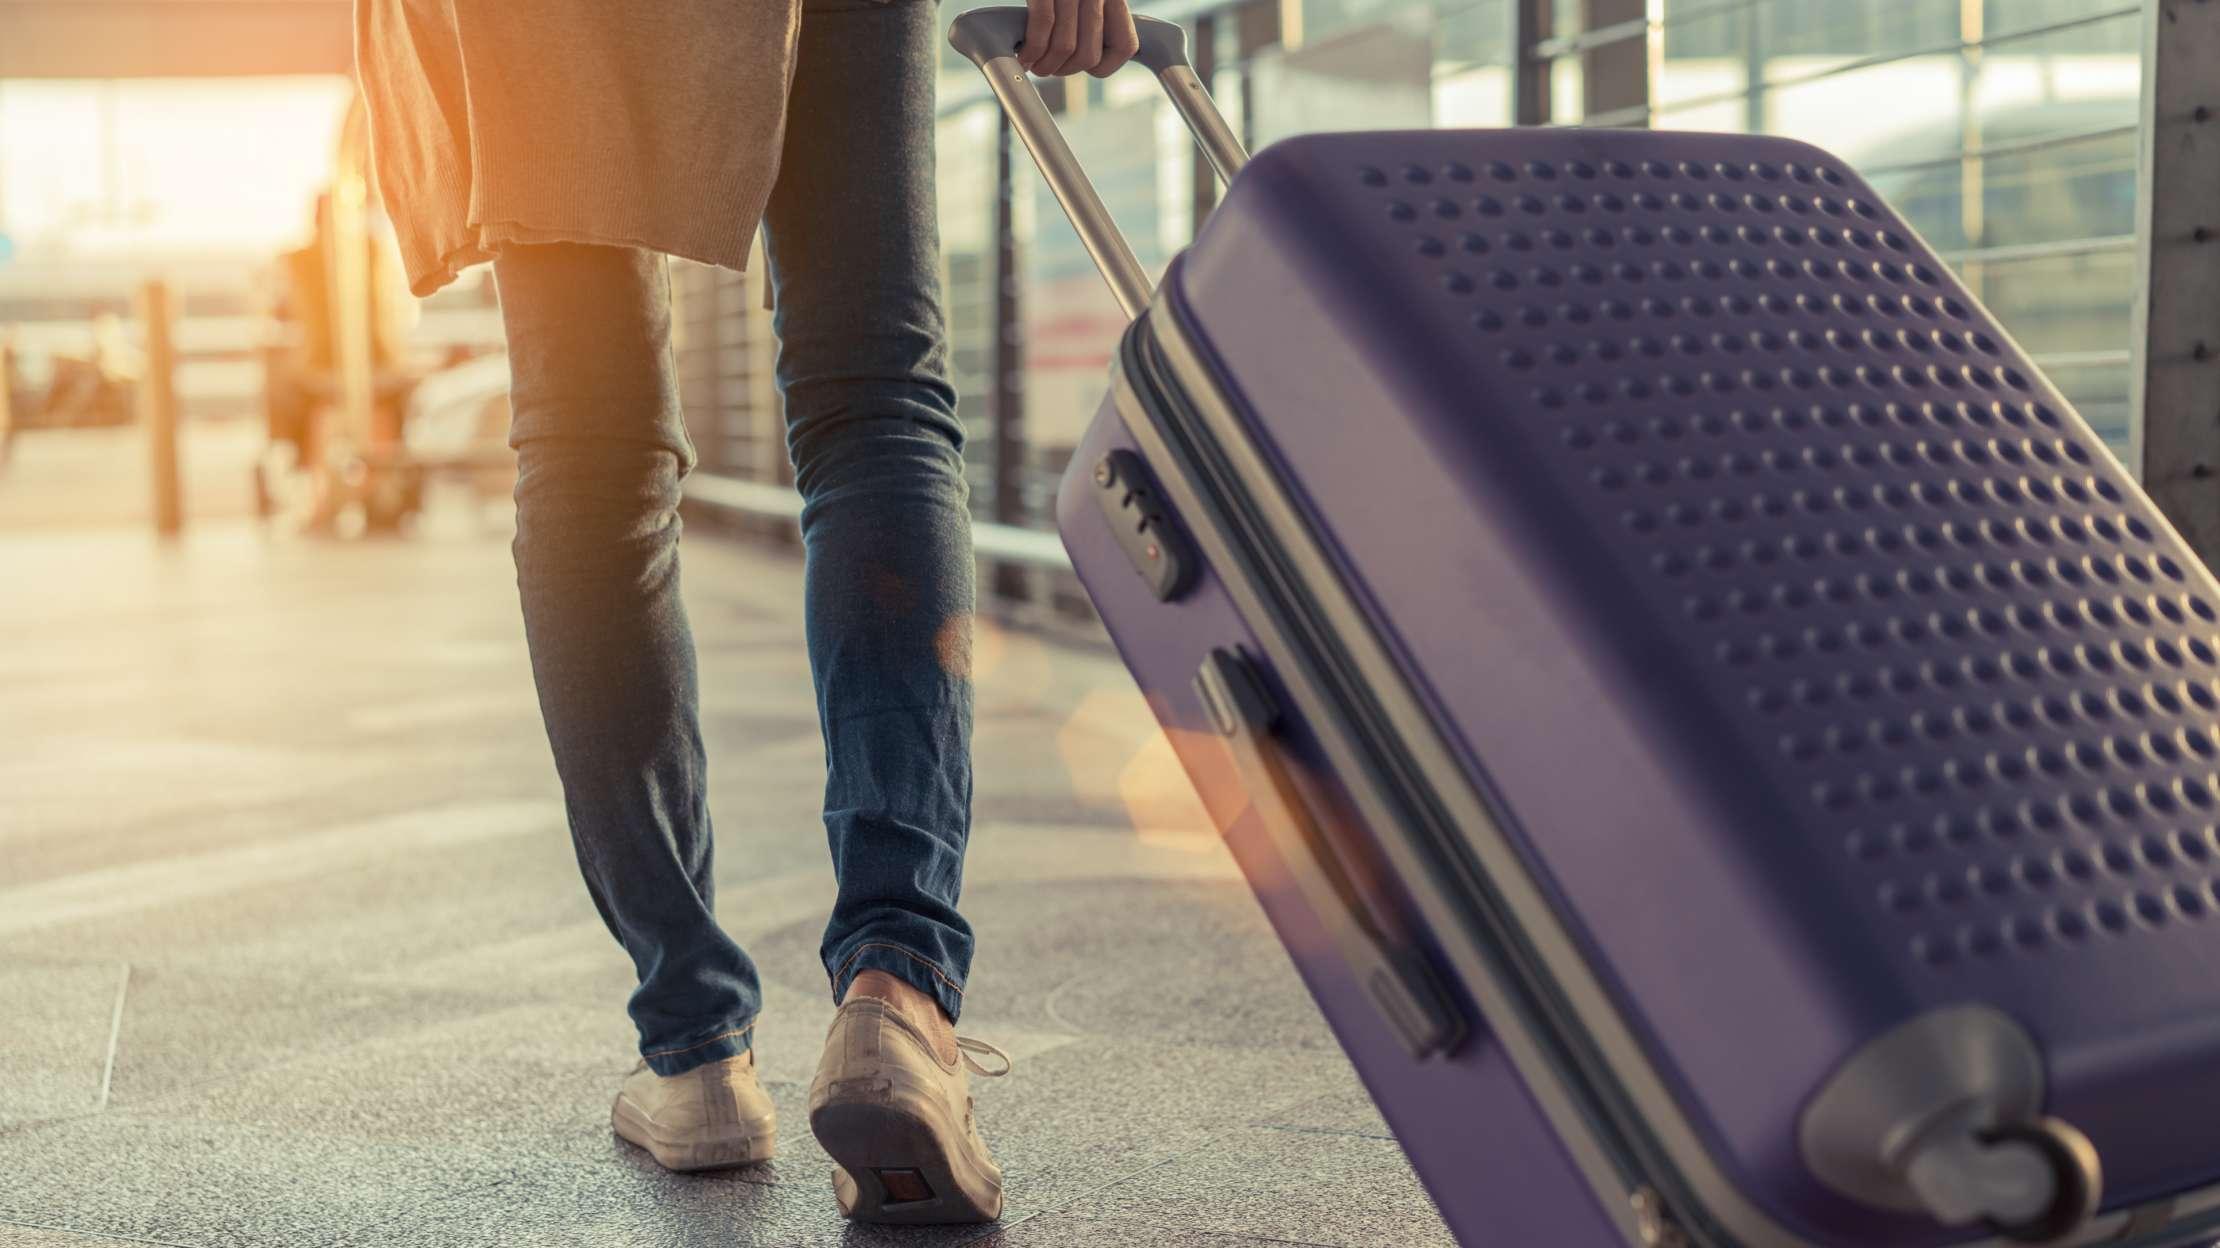 Review - 7 Tips to Plan a Memorable Getaway Trip